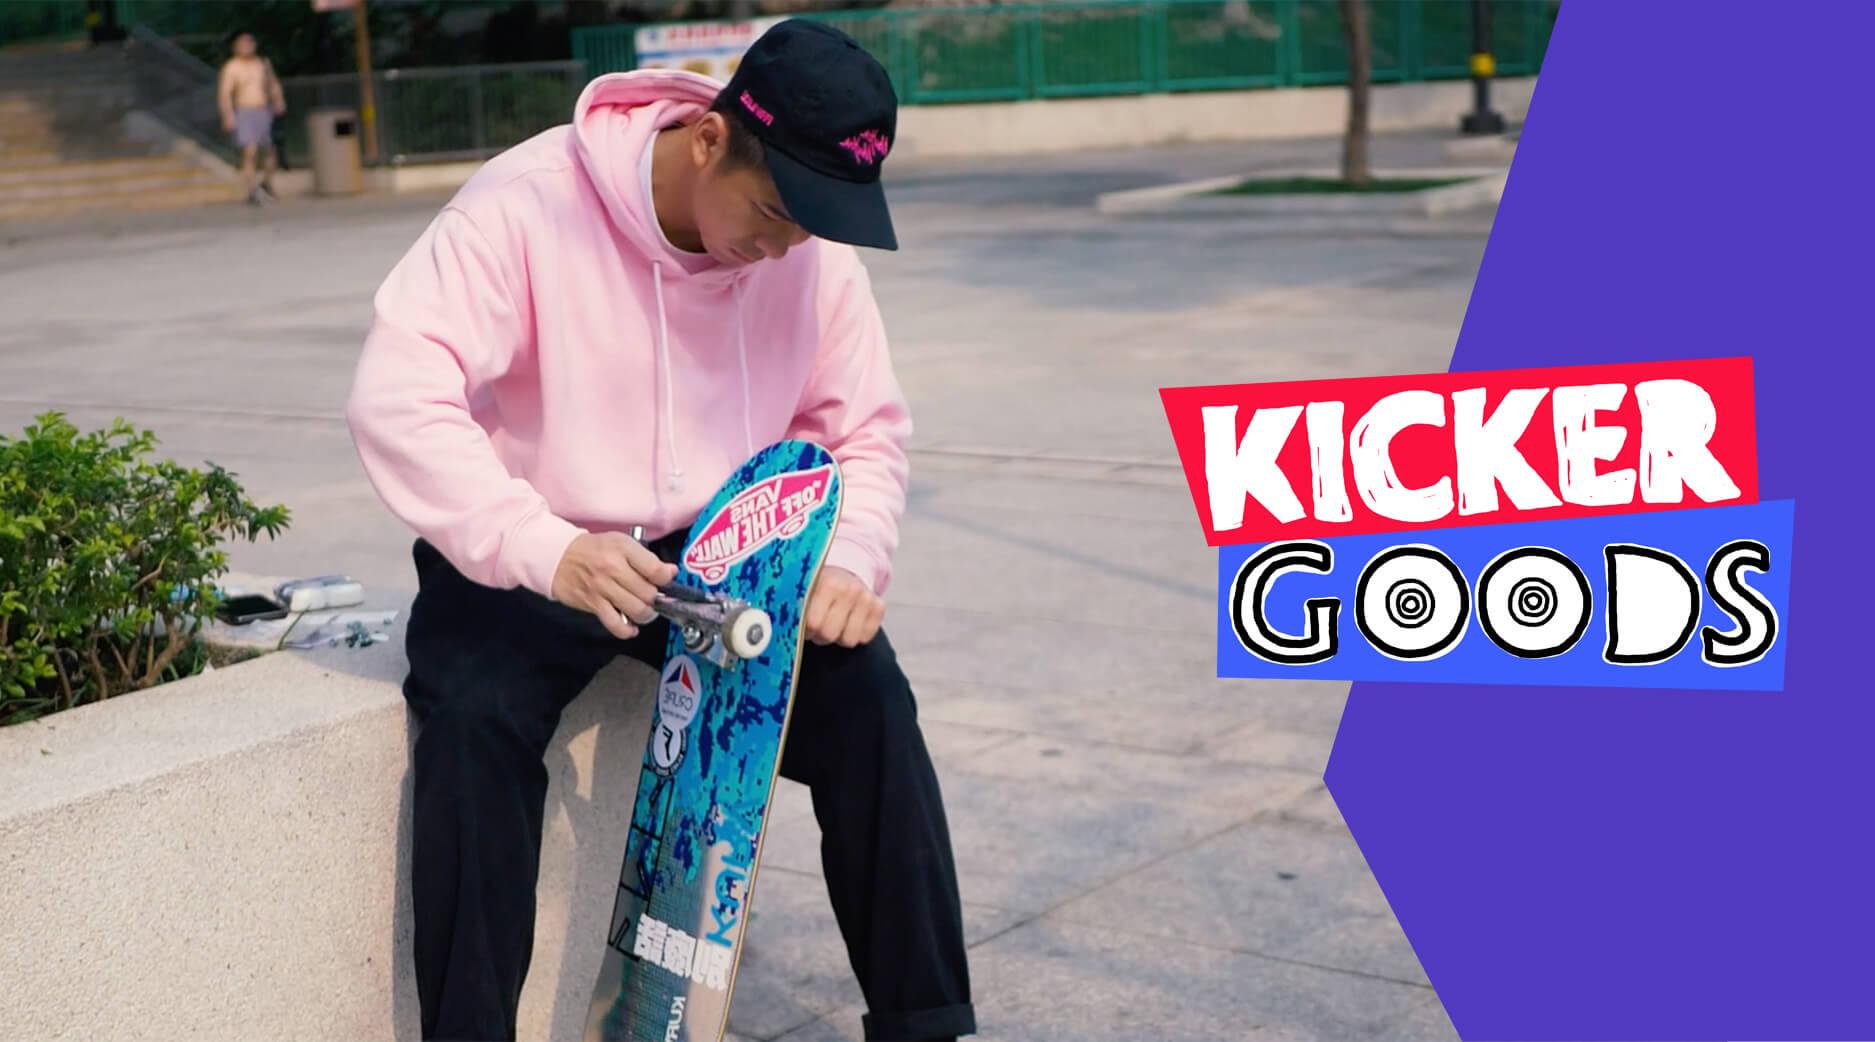 KickerGoods3 – 号称靓仔无罪嘅香港板仔俊仔嘅私伙滑板装备